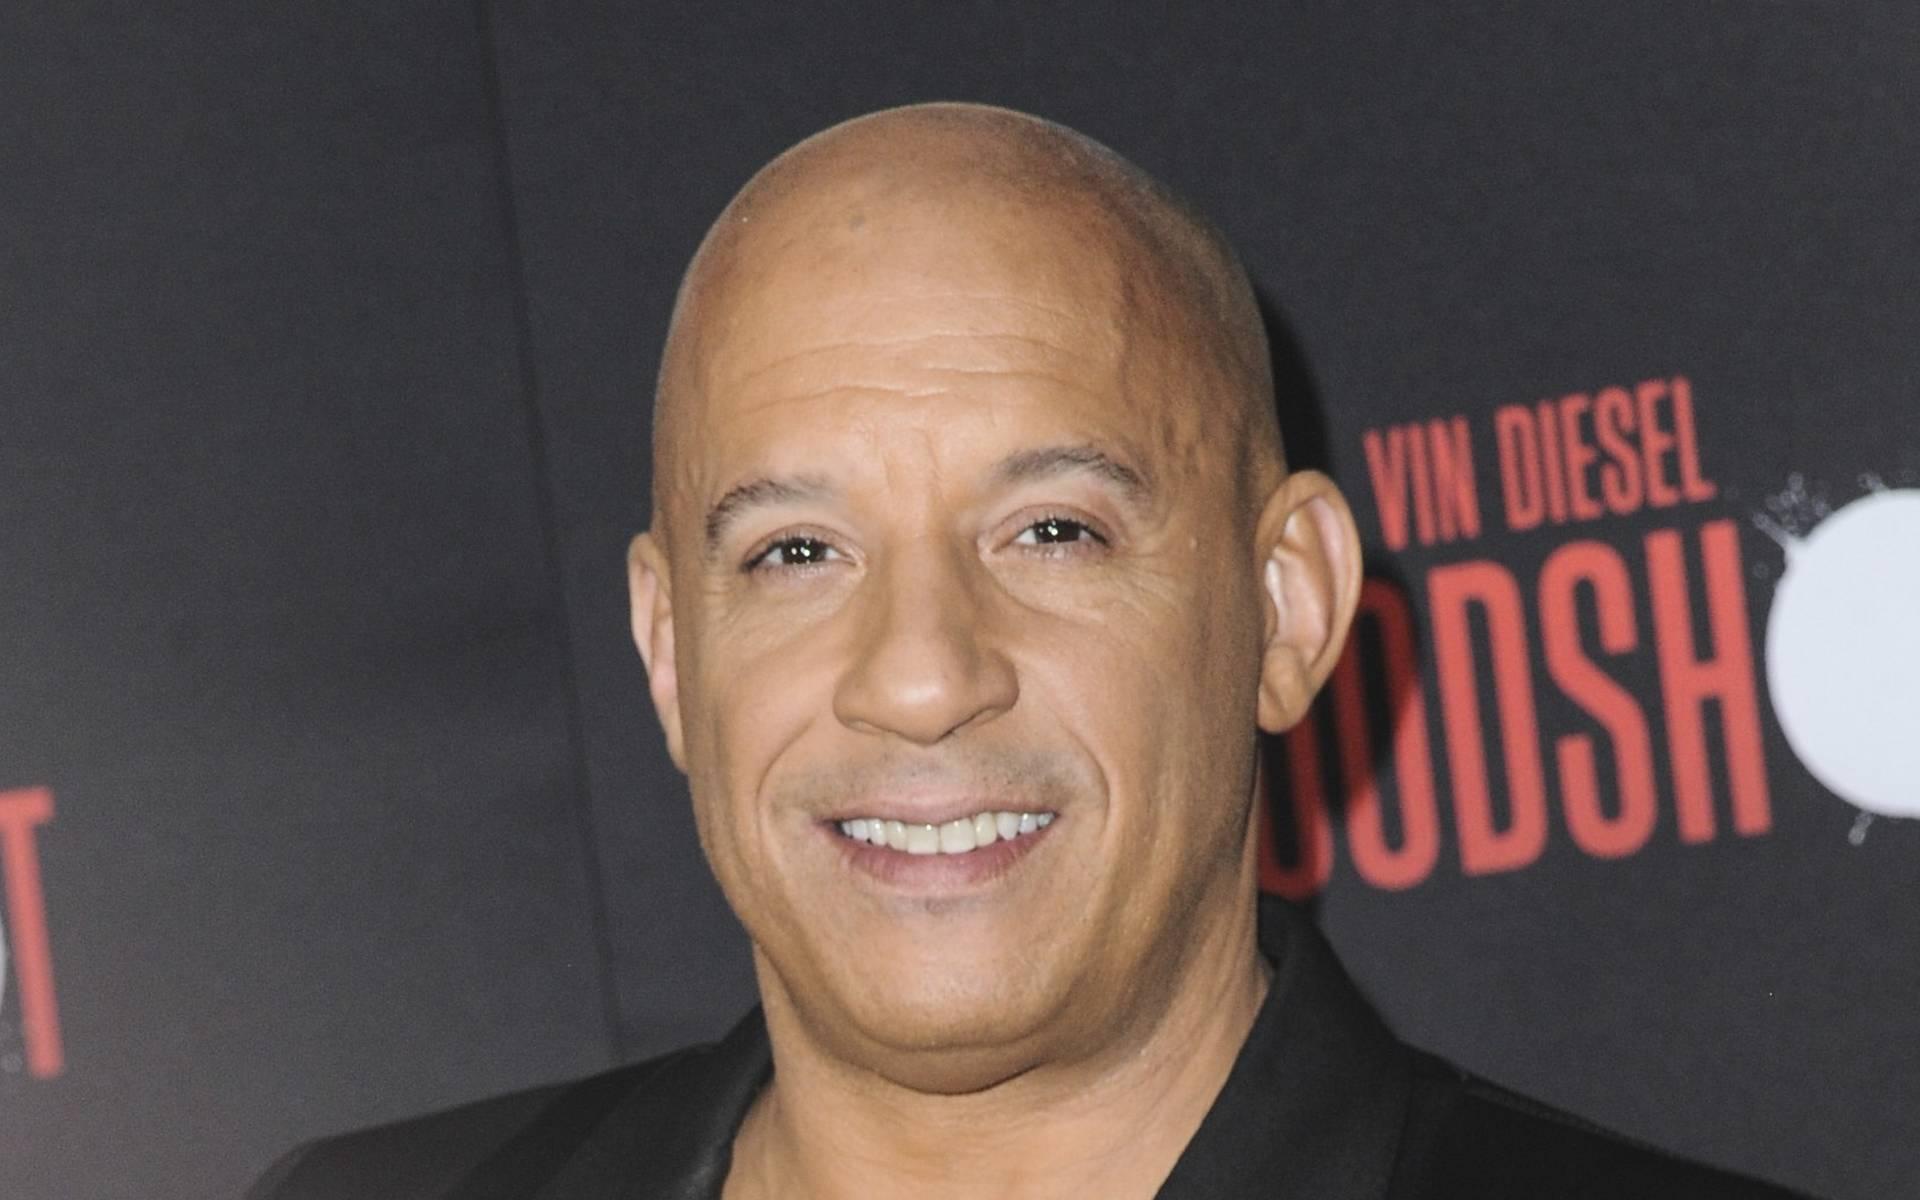 Steven Spielberg wants Vin Diesel to direct more movies ...